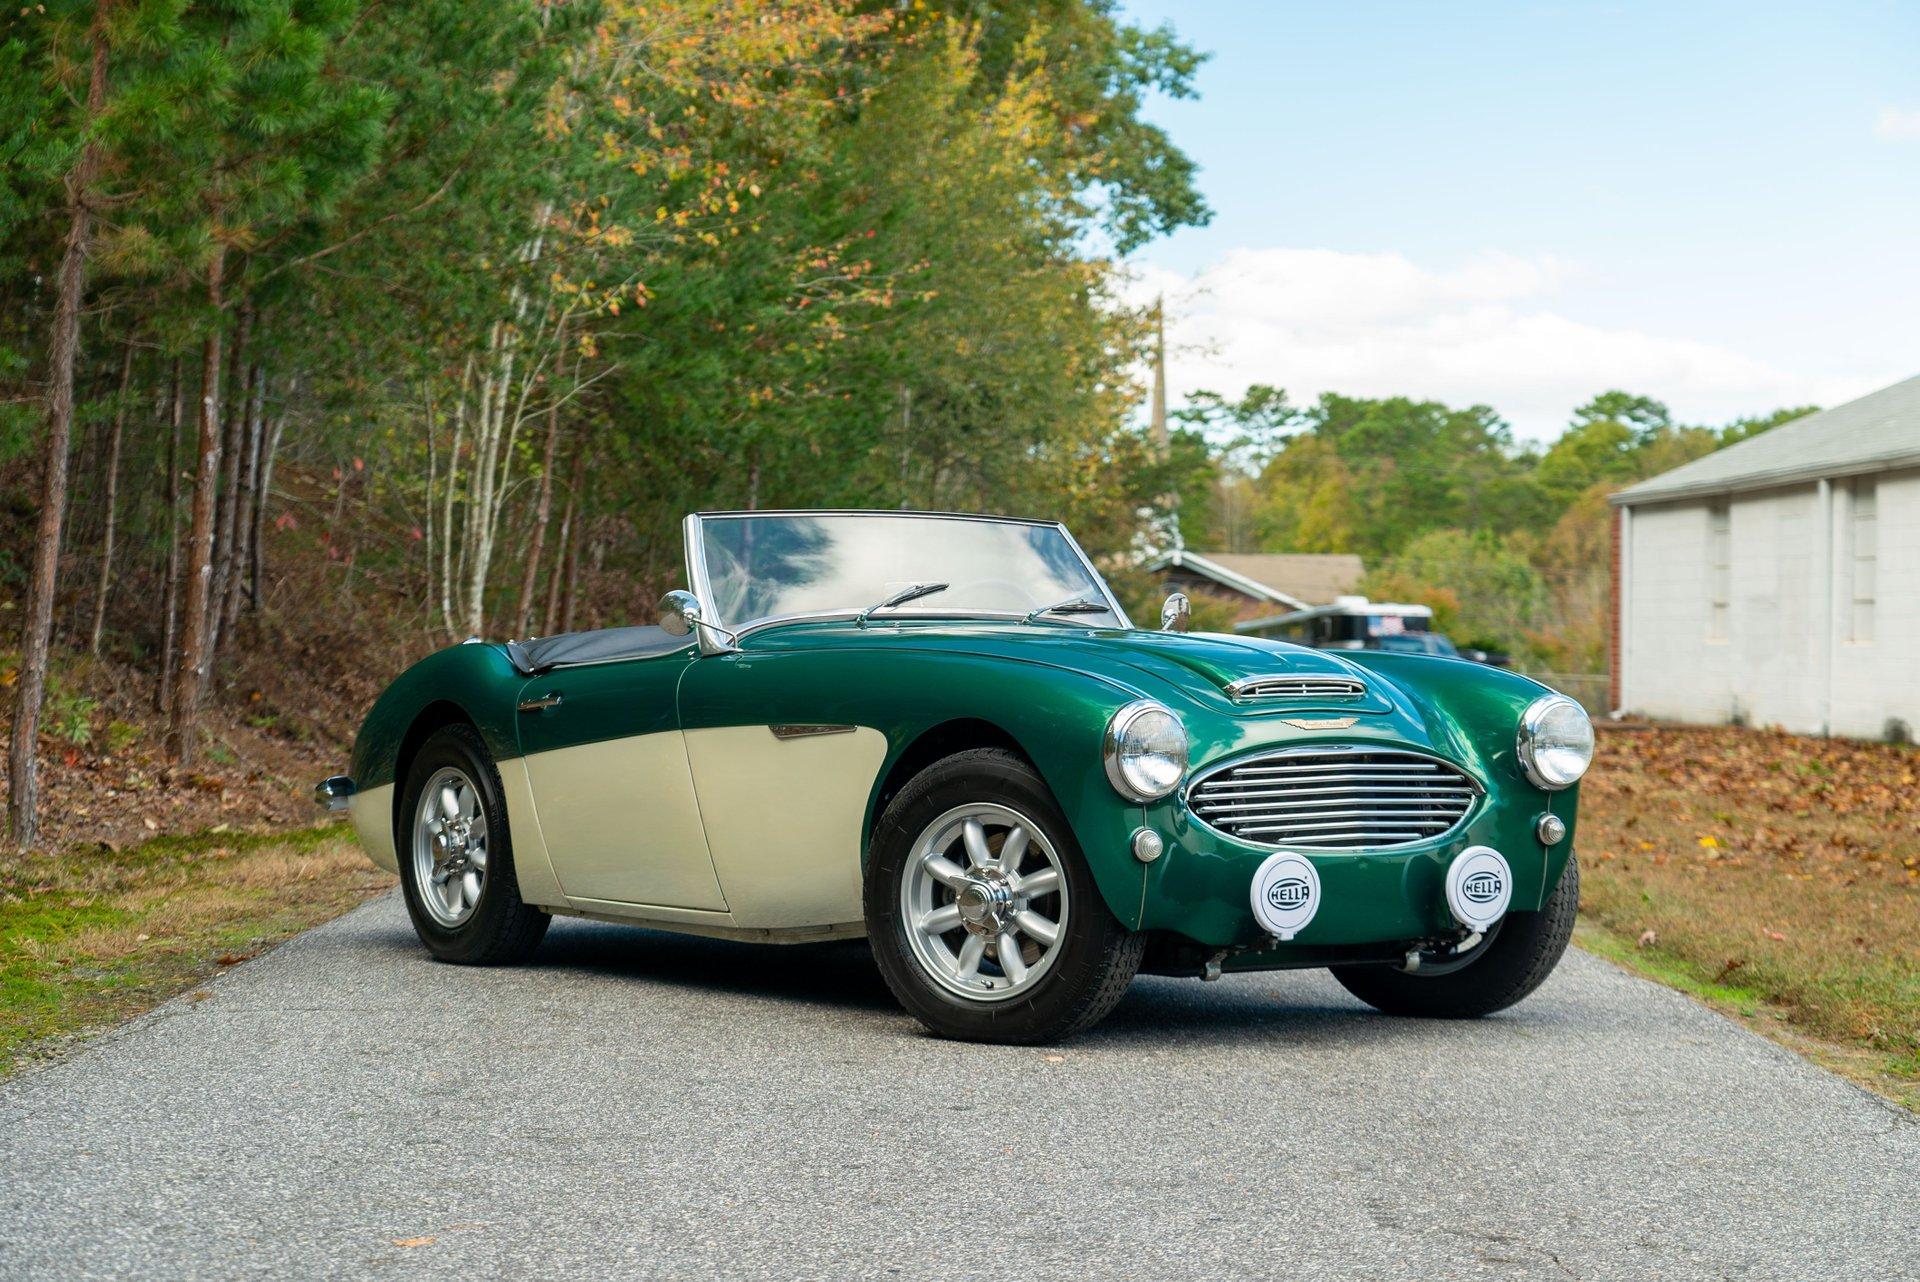 1959 austin healey bn6 100 6